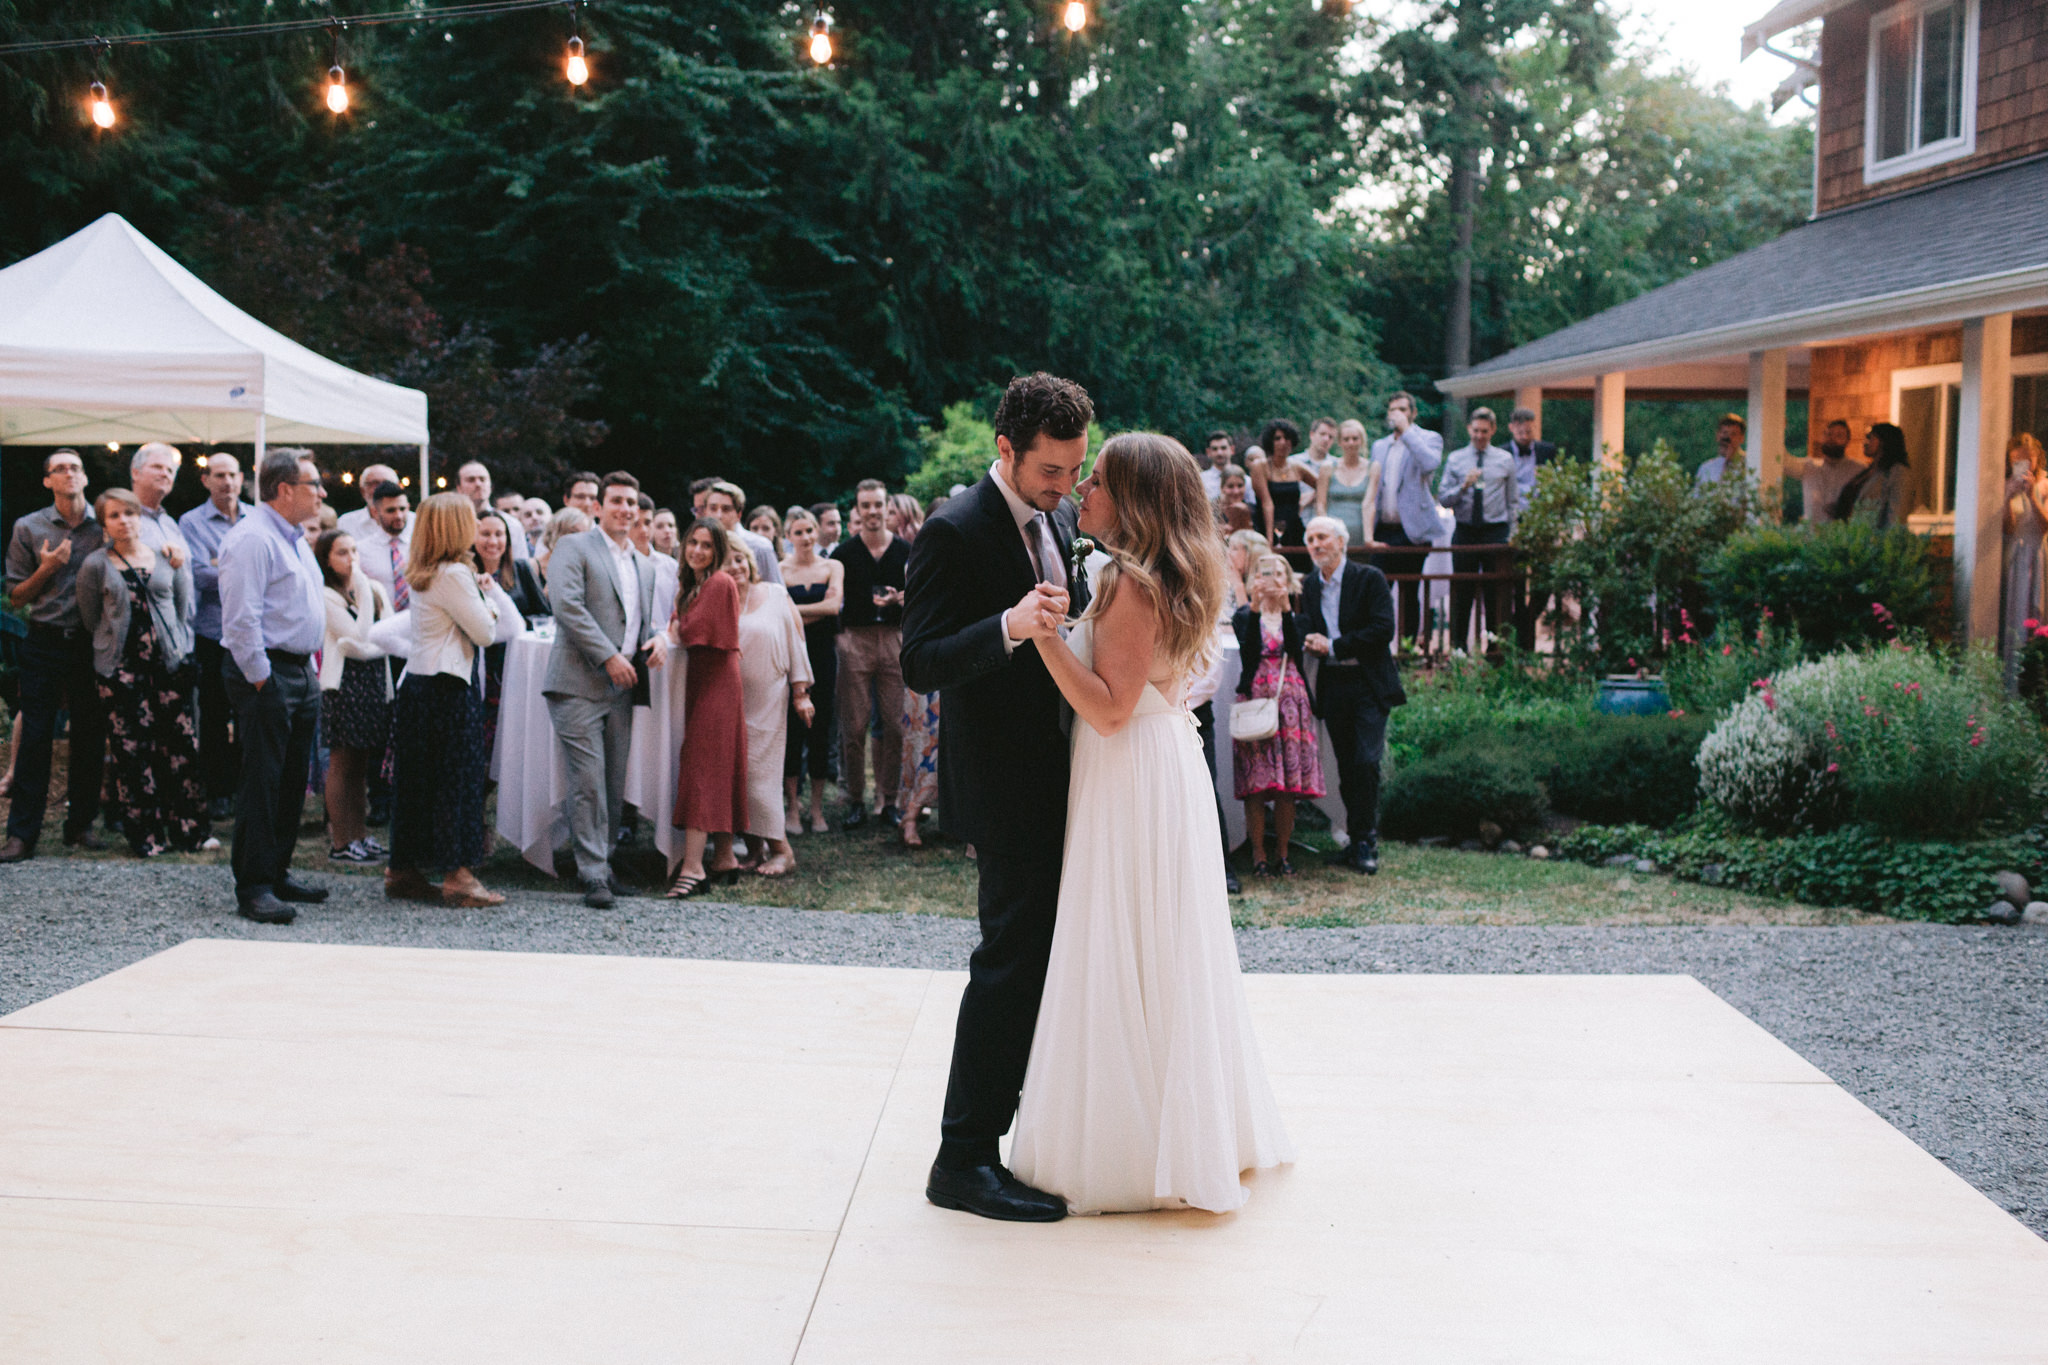 Backyard-Bainbridge-Island-Wedding-Alycia-Lovell-Photography-221.JPG